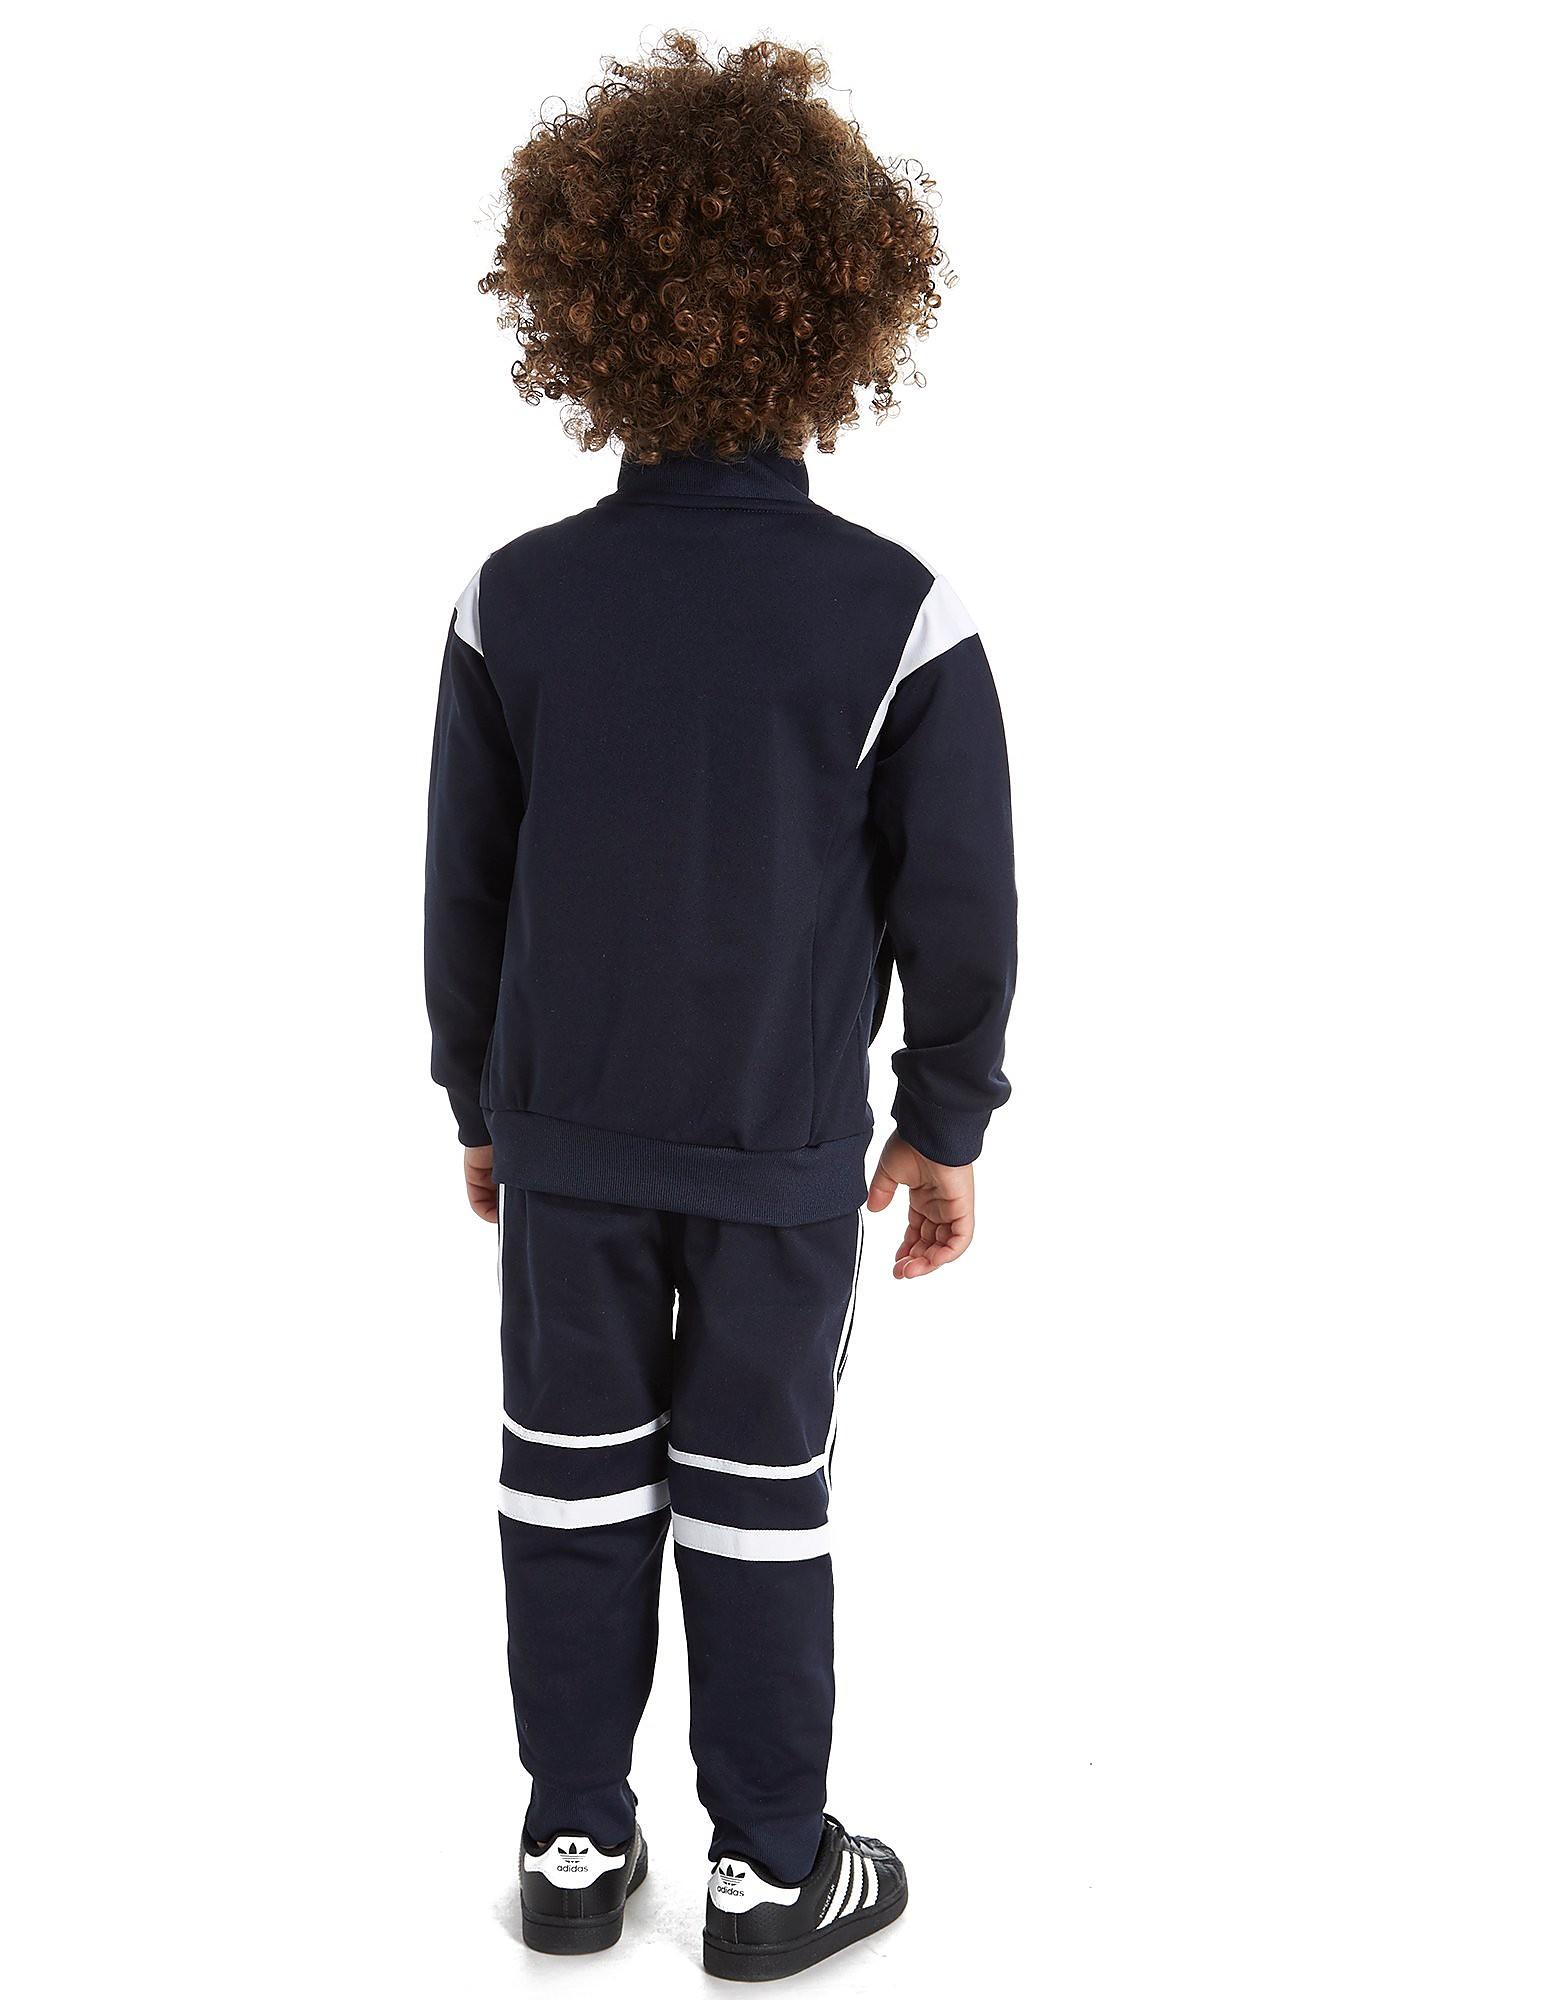 adidas Originals Challenger Suit